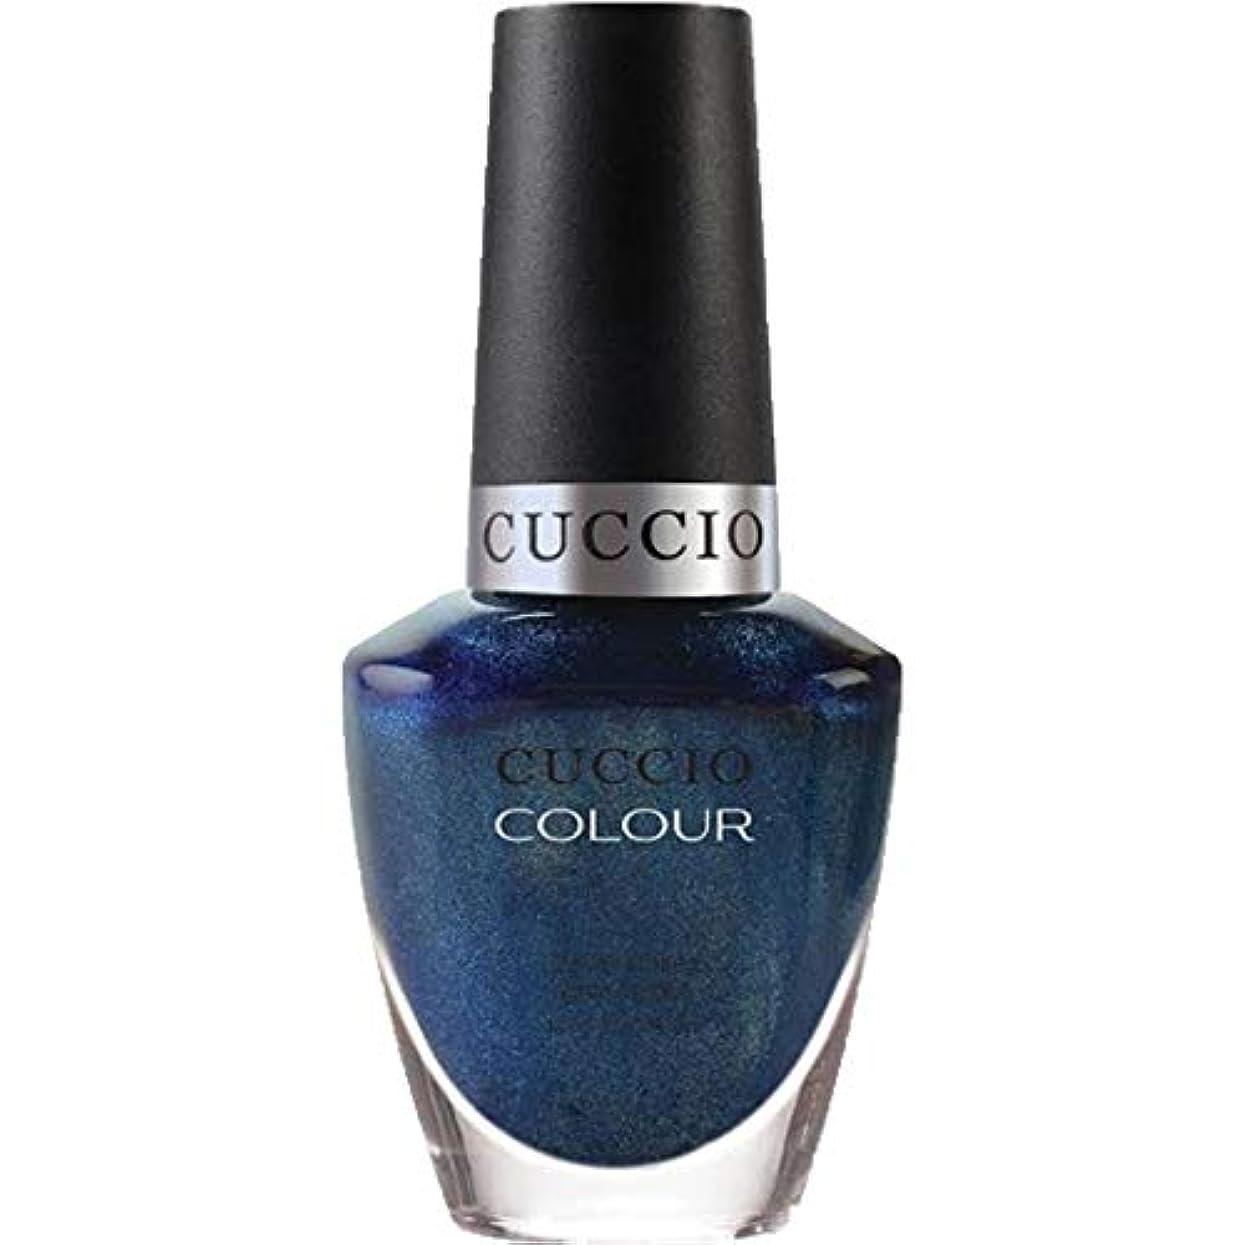 発揮する学部長腹部Cuccio Colour Gloss Lacquer - Private Eye - 0.43oz / 13ml